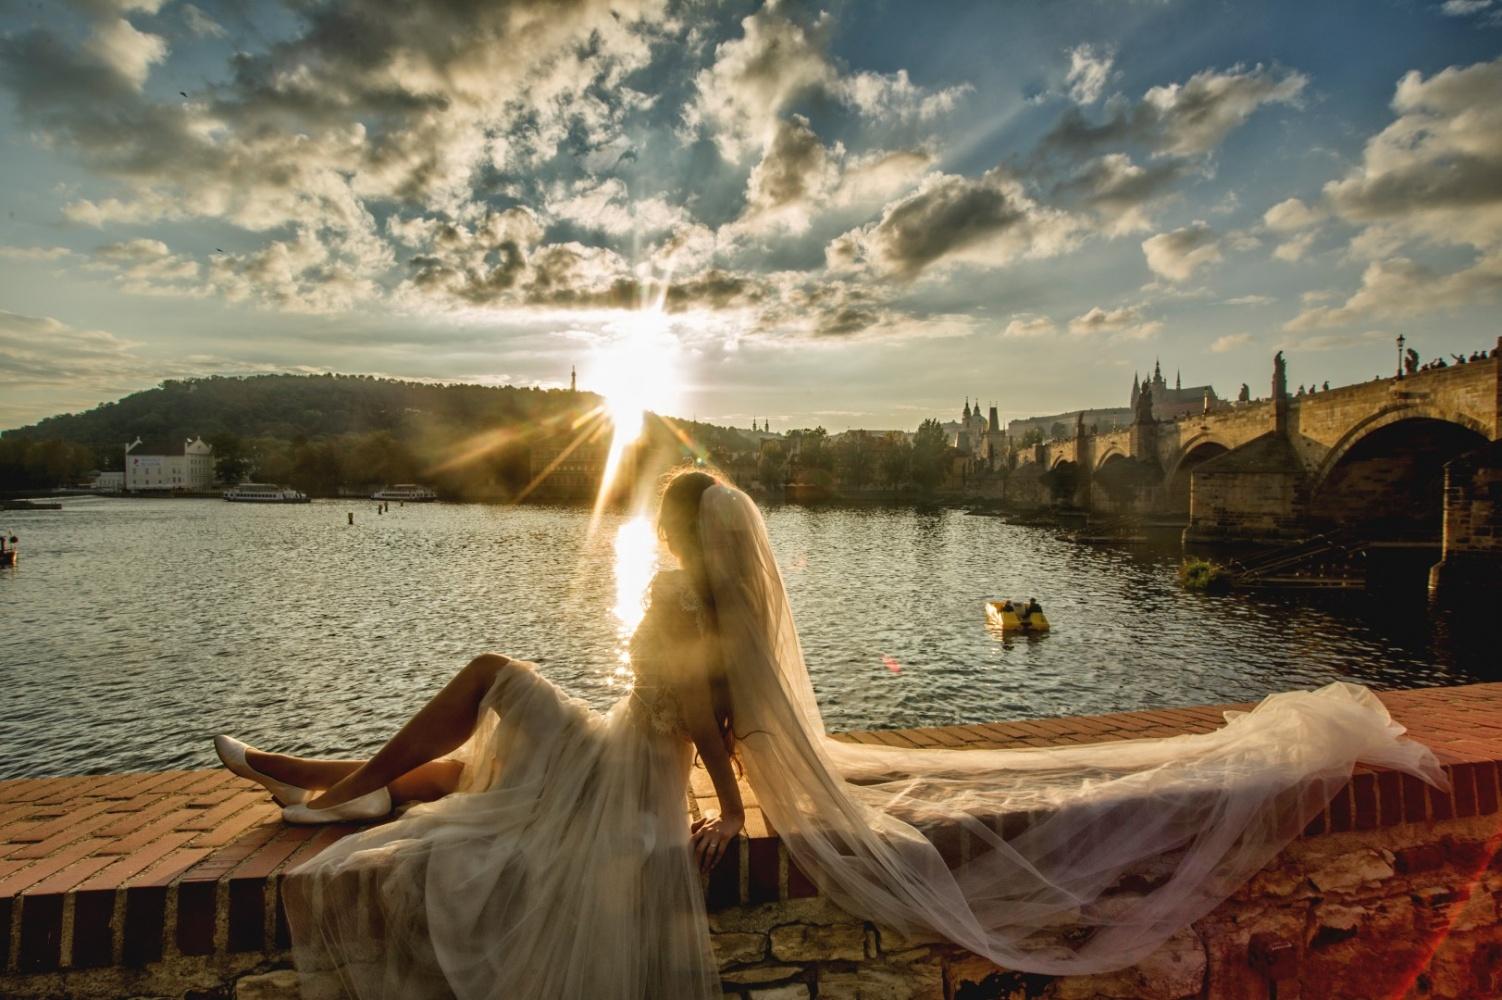 http://www.fotoz.sk/images/gallery-36/normal/svadobny-fotograf_eskuvoi-fotos_lacny-fotograf_fotograf-na-svadbu_plauter-kuria_fotograf-nitra_fotograf-galanta_juraj-zsok049.jpg